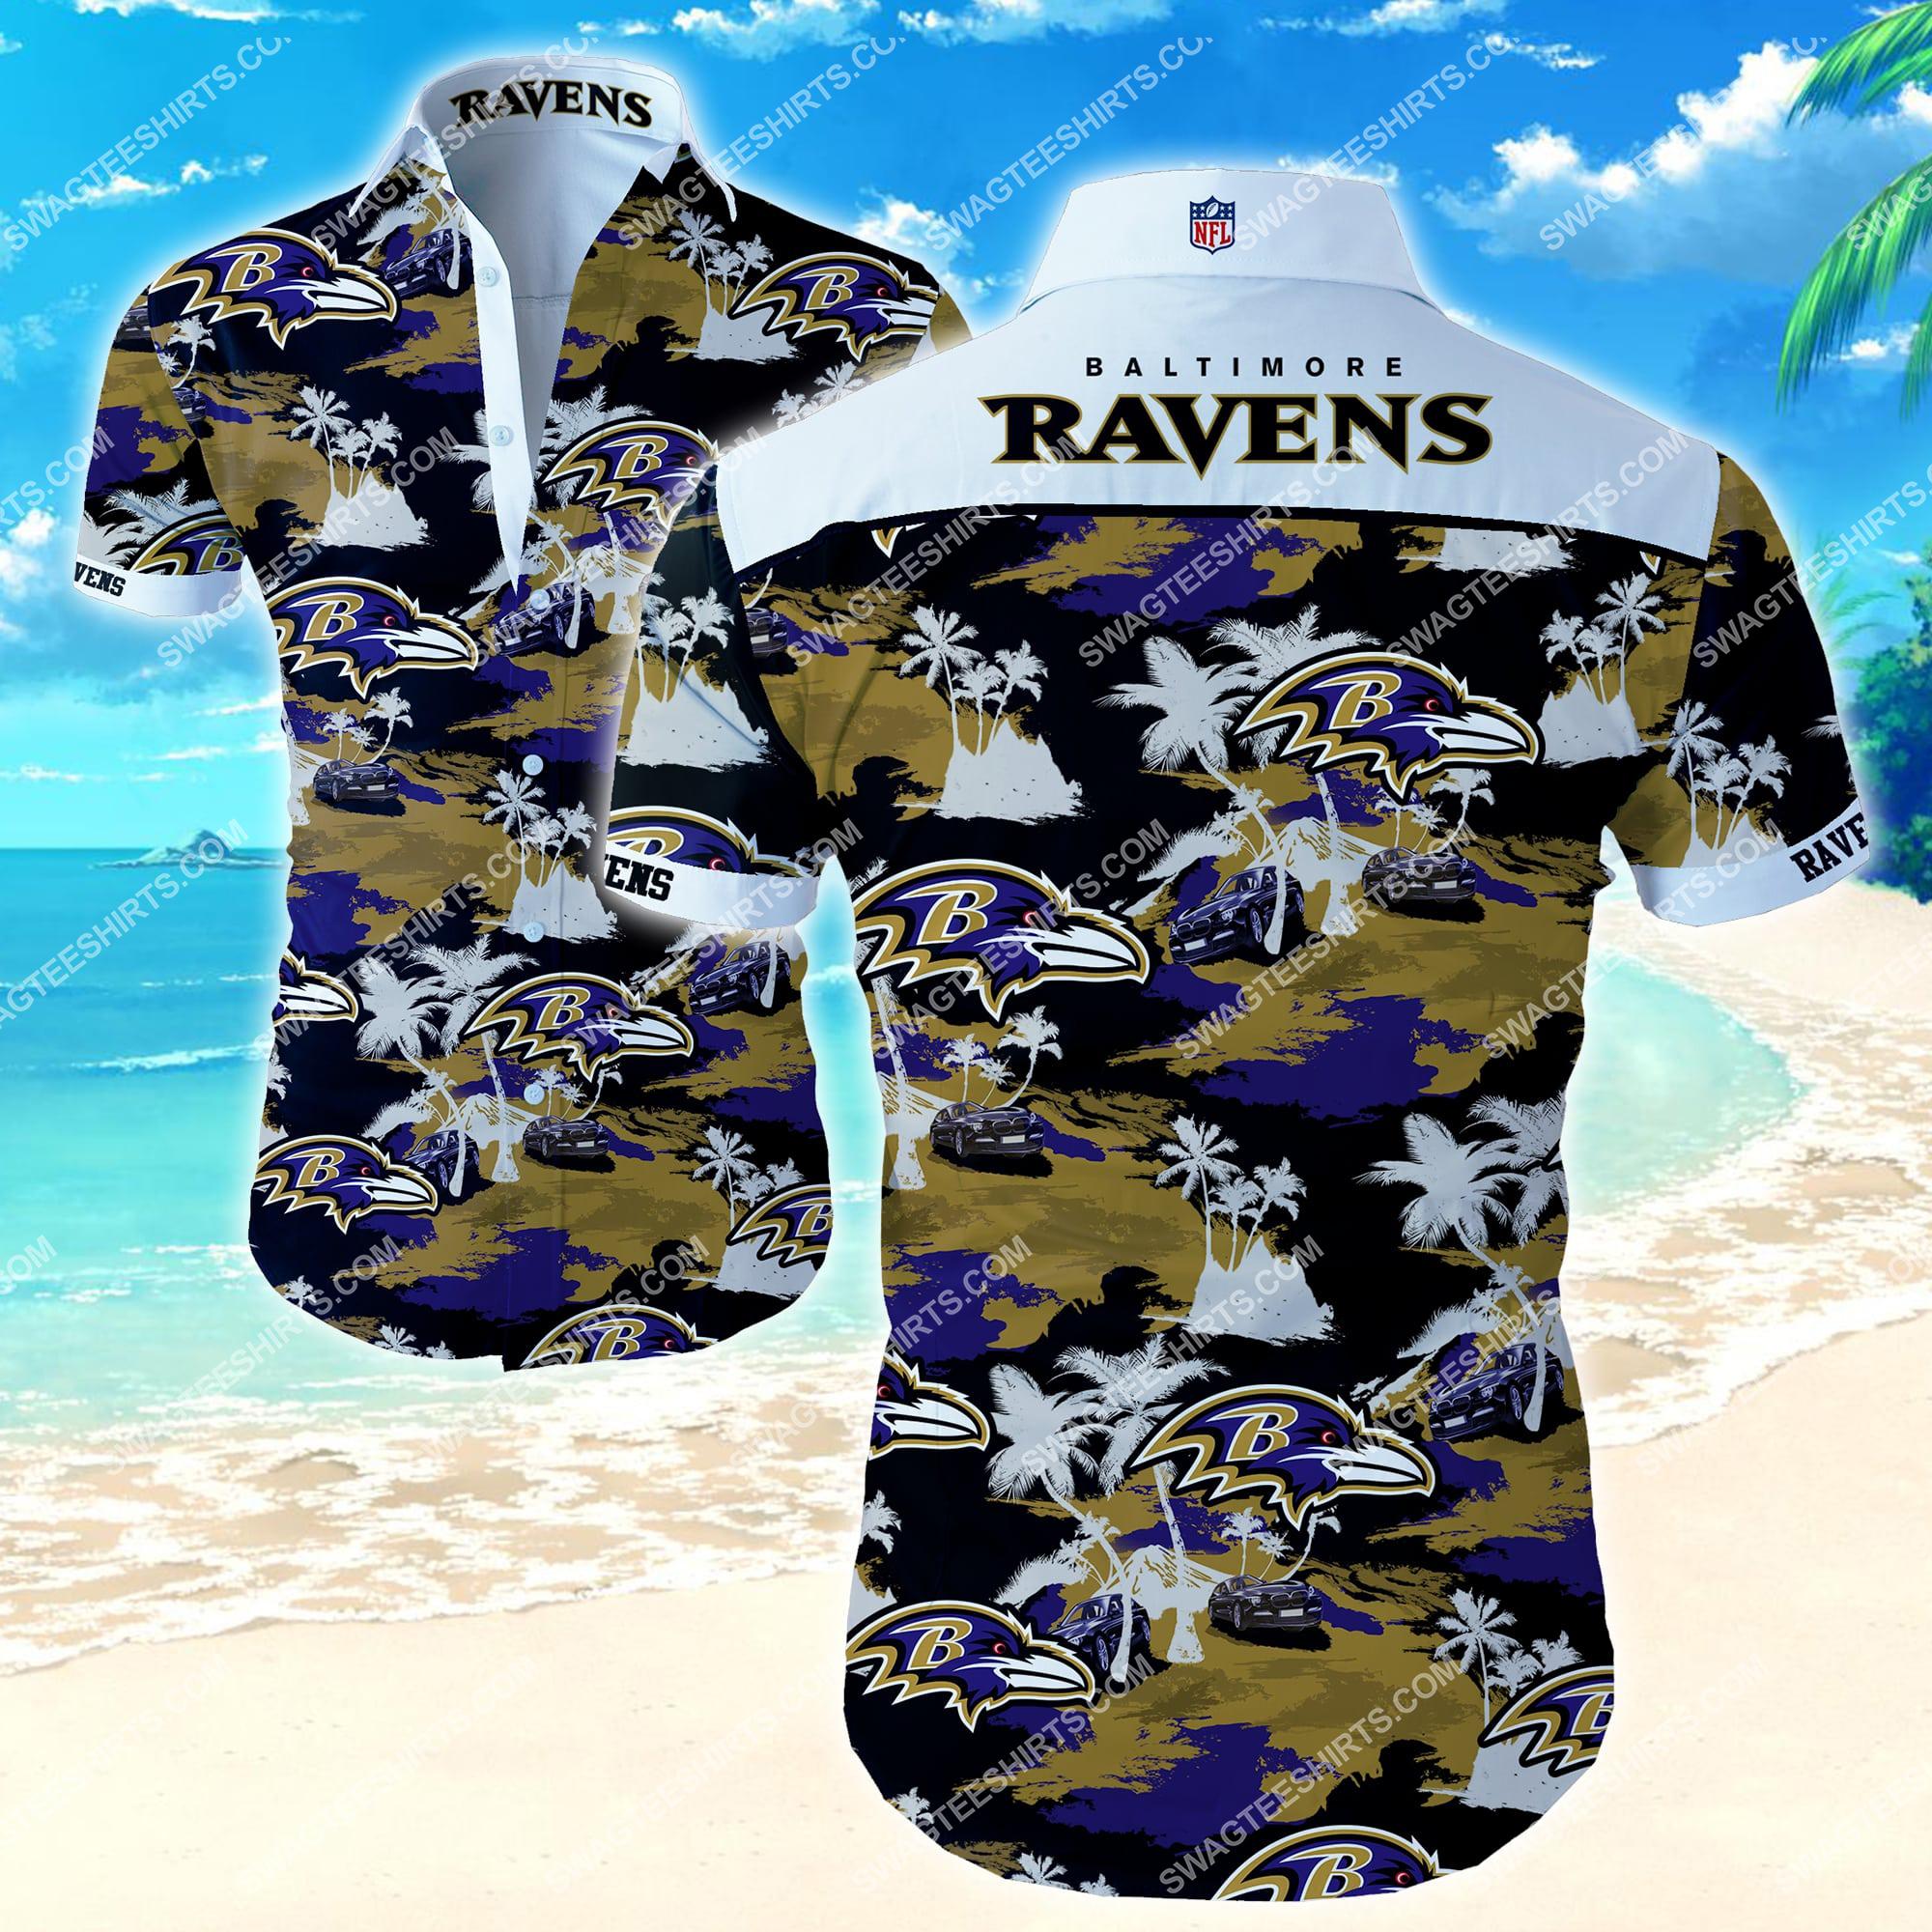 the baltimore ravens football team full printing summer hawaiian shirt 2 - Copy (2)